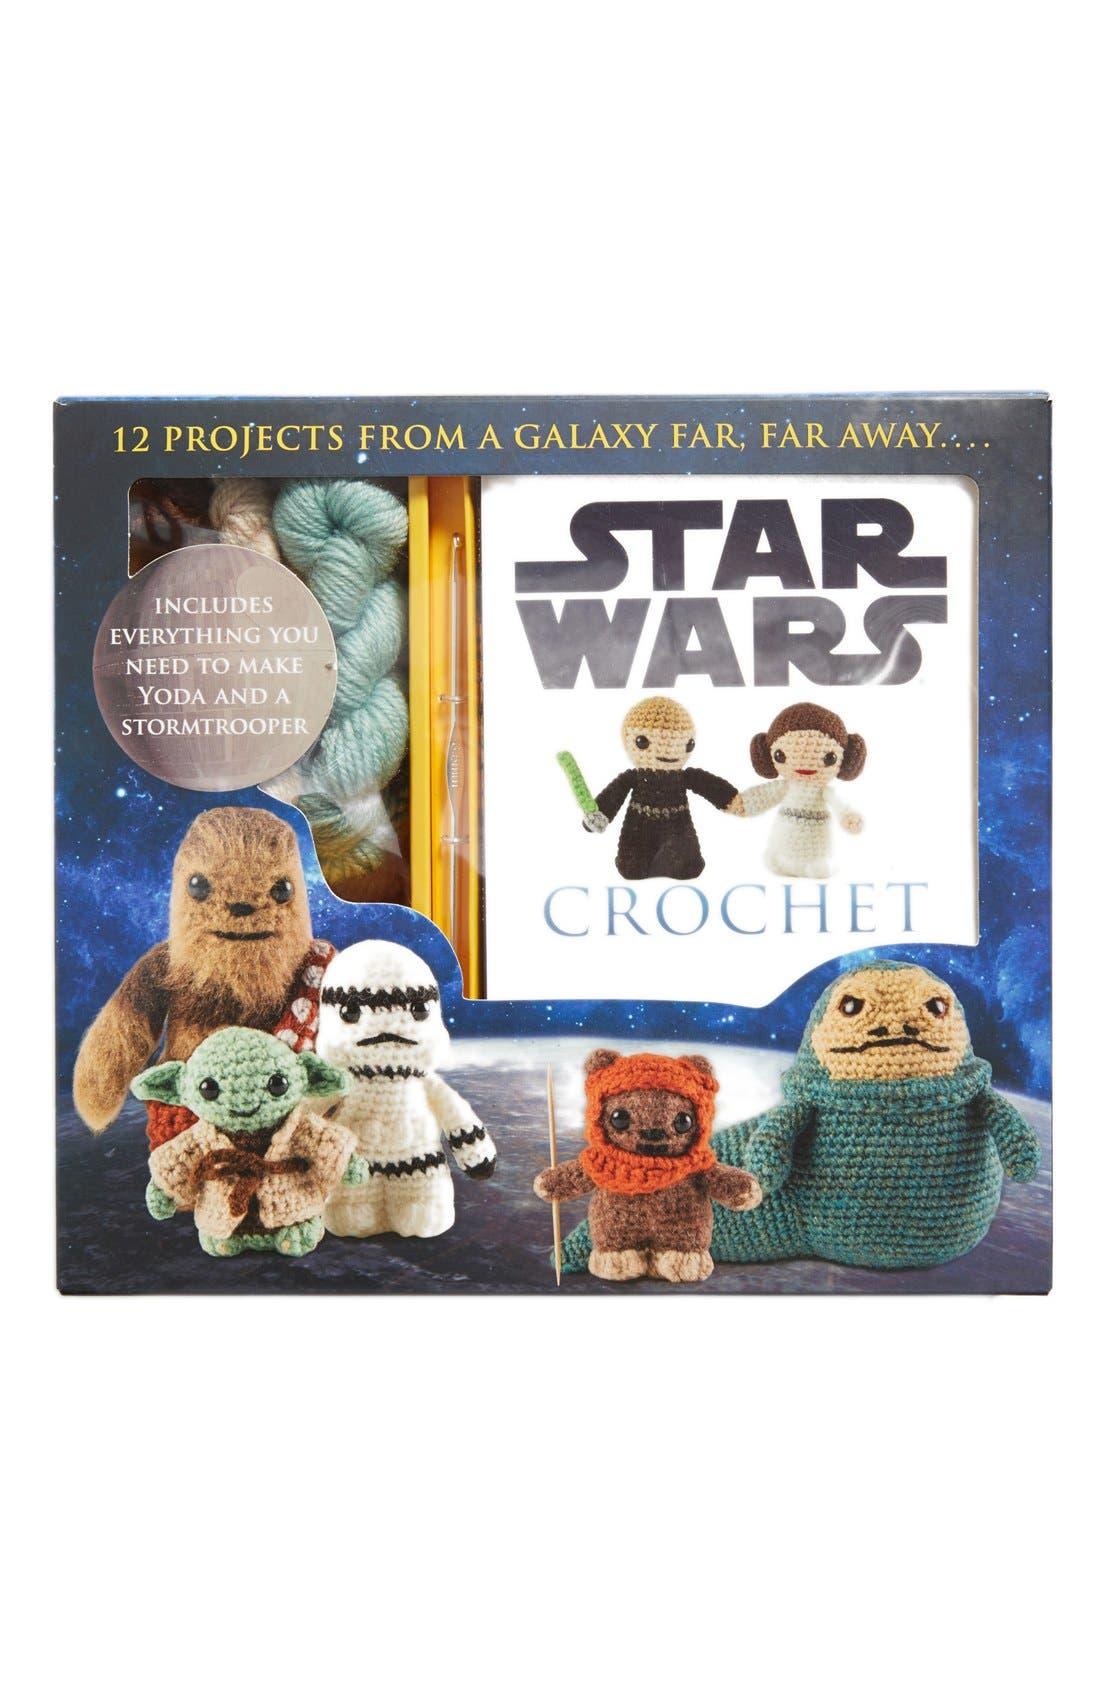 Thunder Bay Press 'Star Wars Crochet' Book & Kit